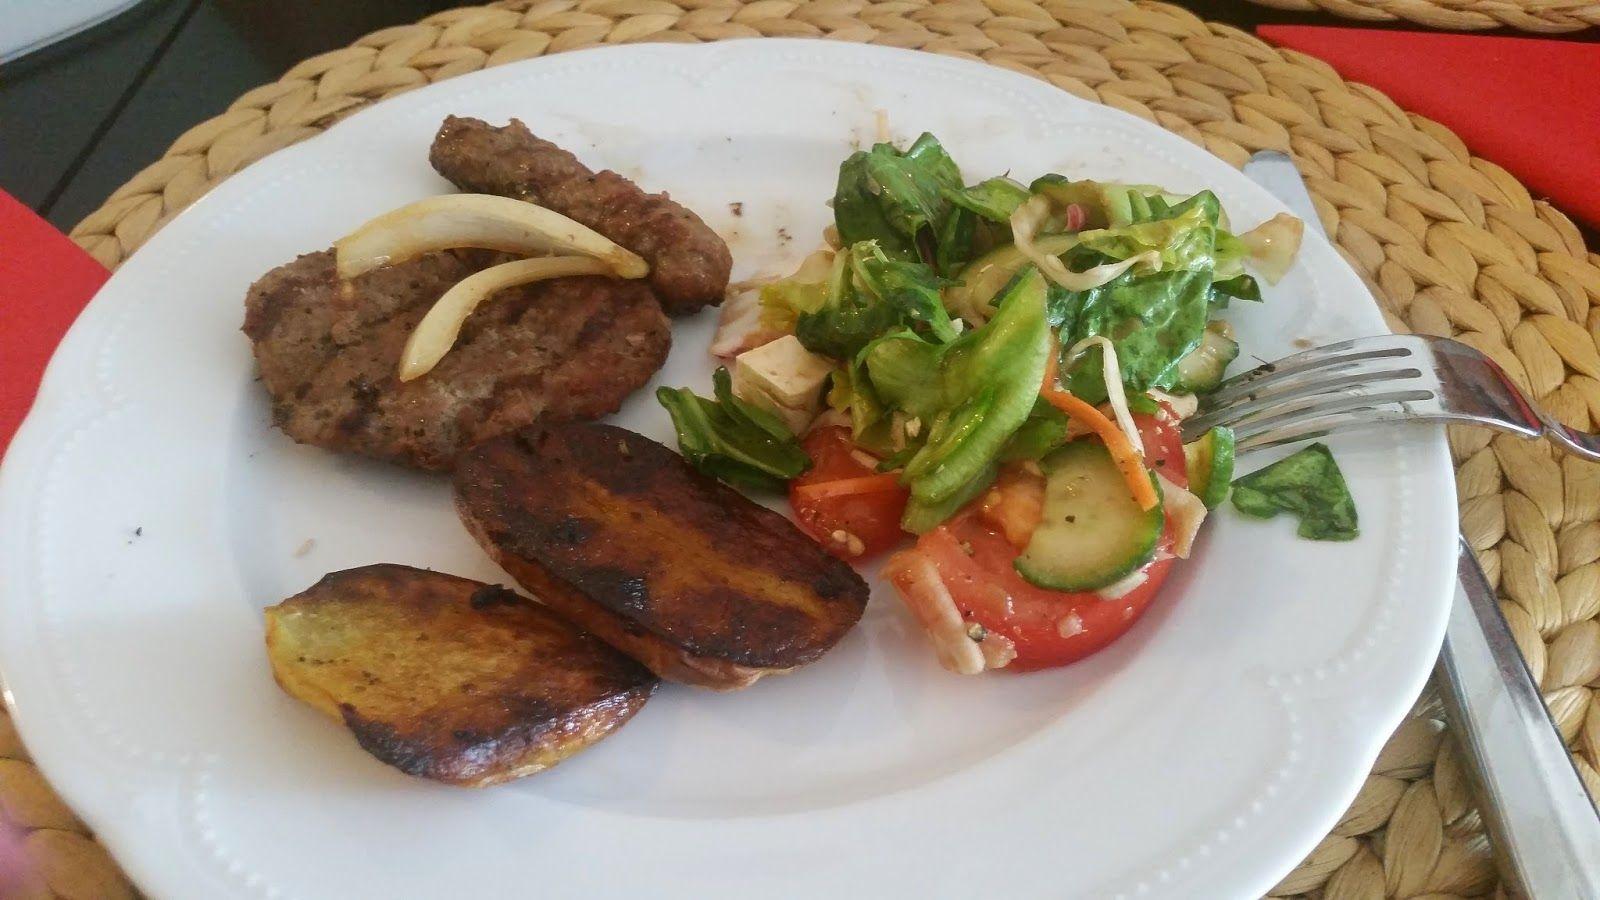 Es ist angerichtet! #Cevapcici #BalkanArt #krupsprepandcook #Prepandcook #Rezepte #Küchenmaschine #Kochfunktion #Multiküchenmaschine #Leckerscouts